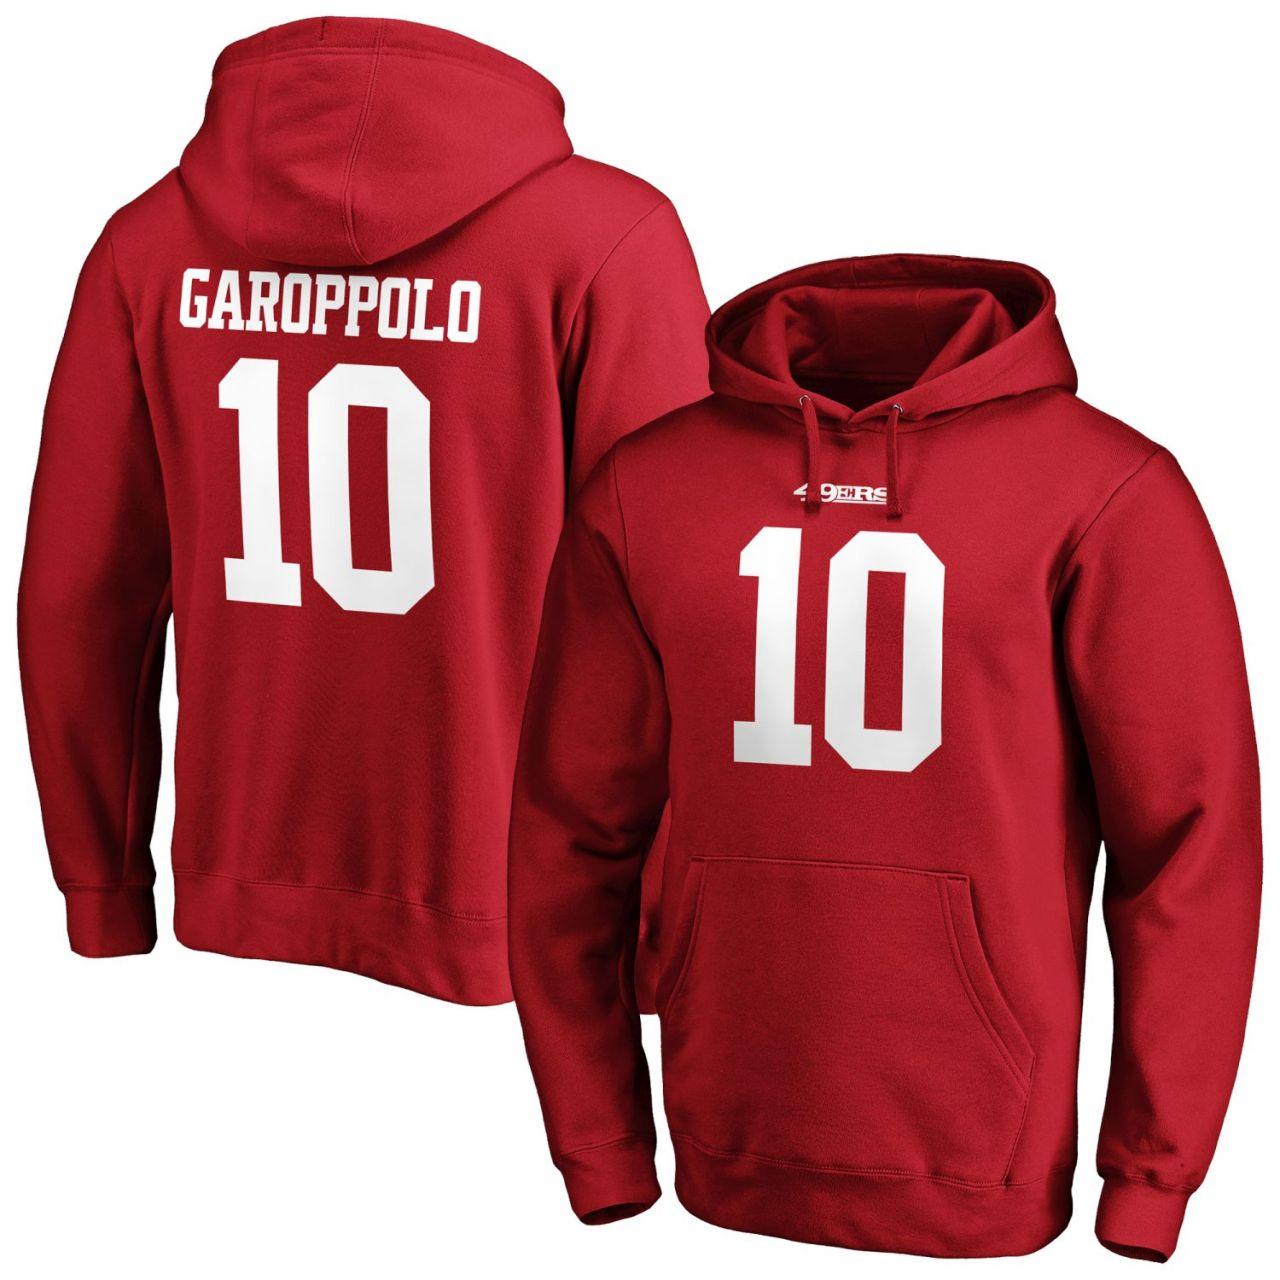 amfoo - San Francisco 49ers NFL Hoody #15 Jimmy Garoppolo